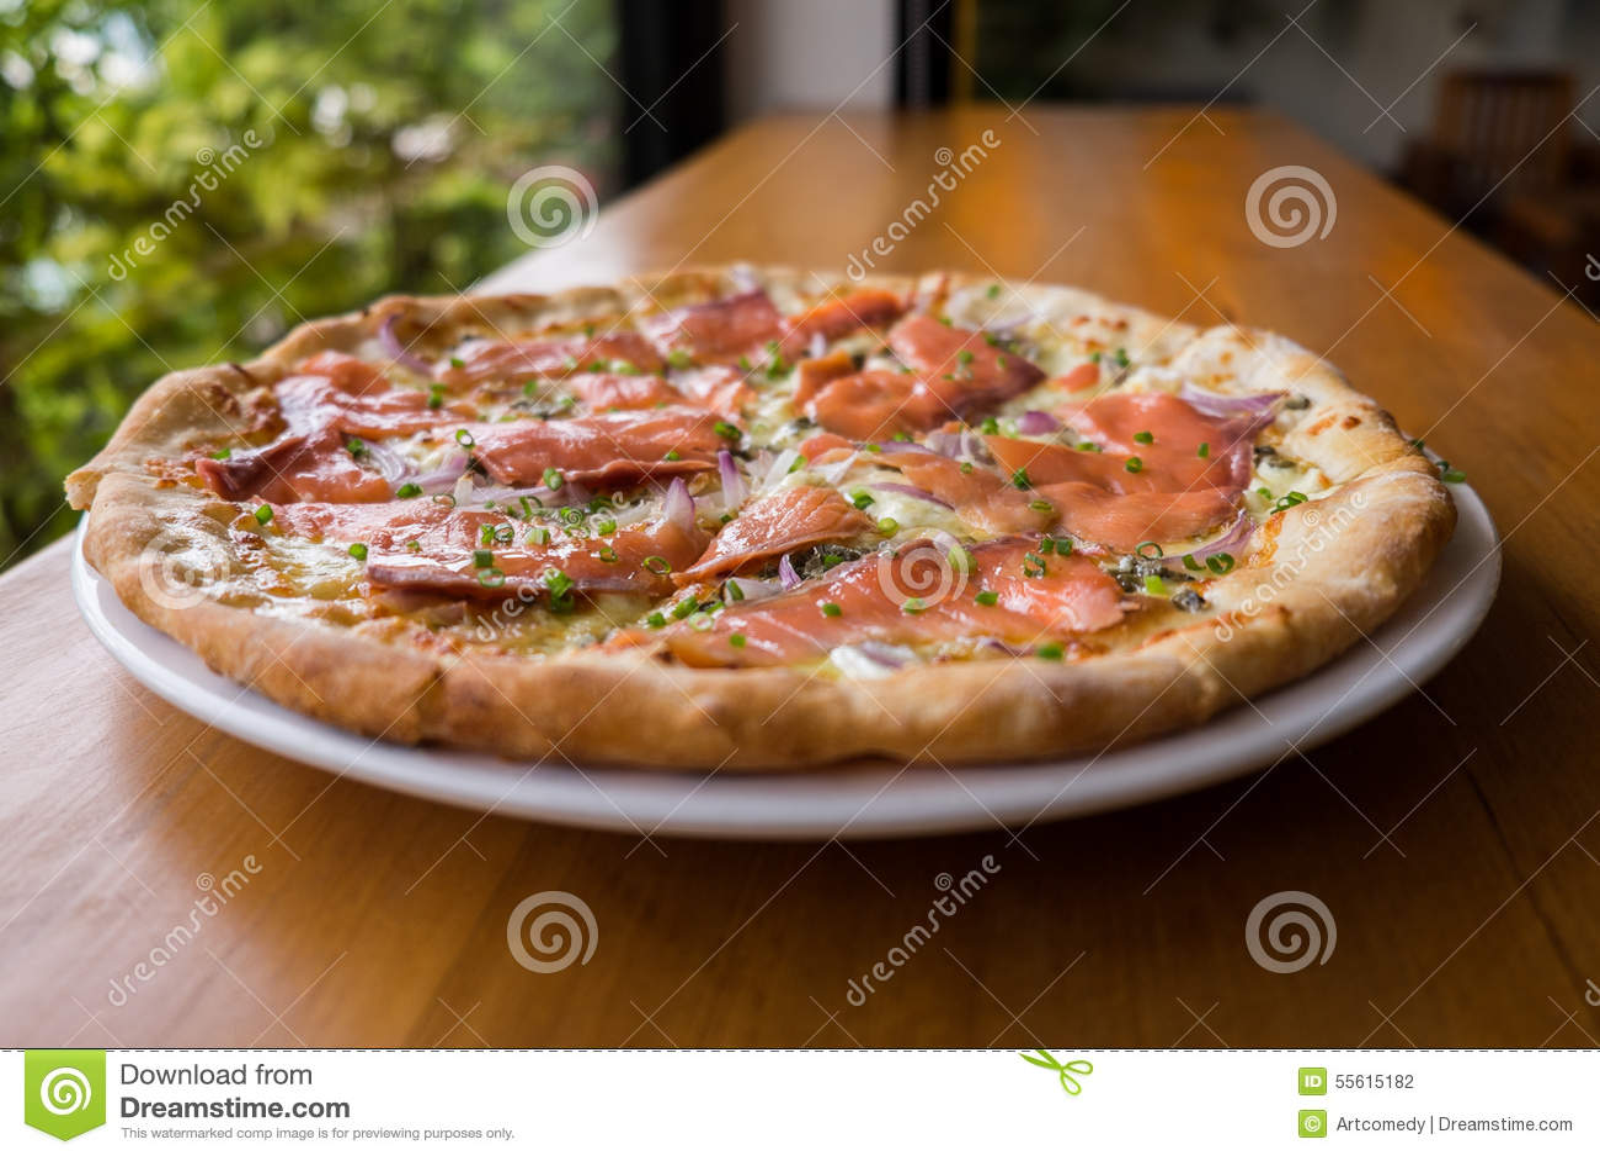 pizza mit ger uchertem lachs stockfoto bild 55615182. Black Bedroom Furniture Sets. Home Design Ideas